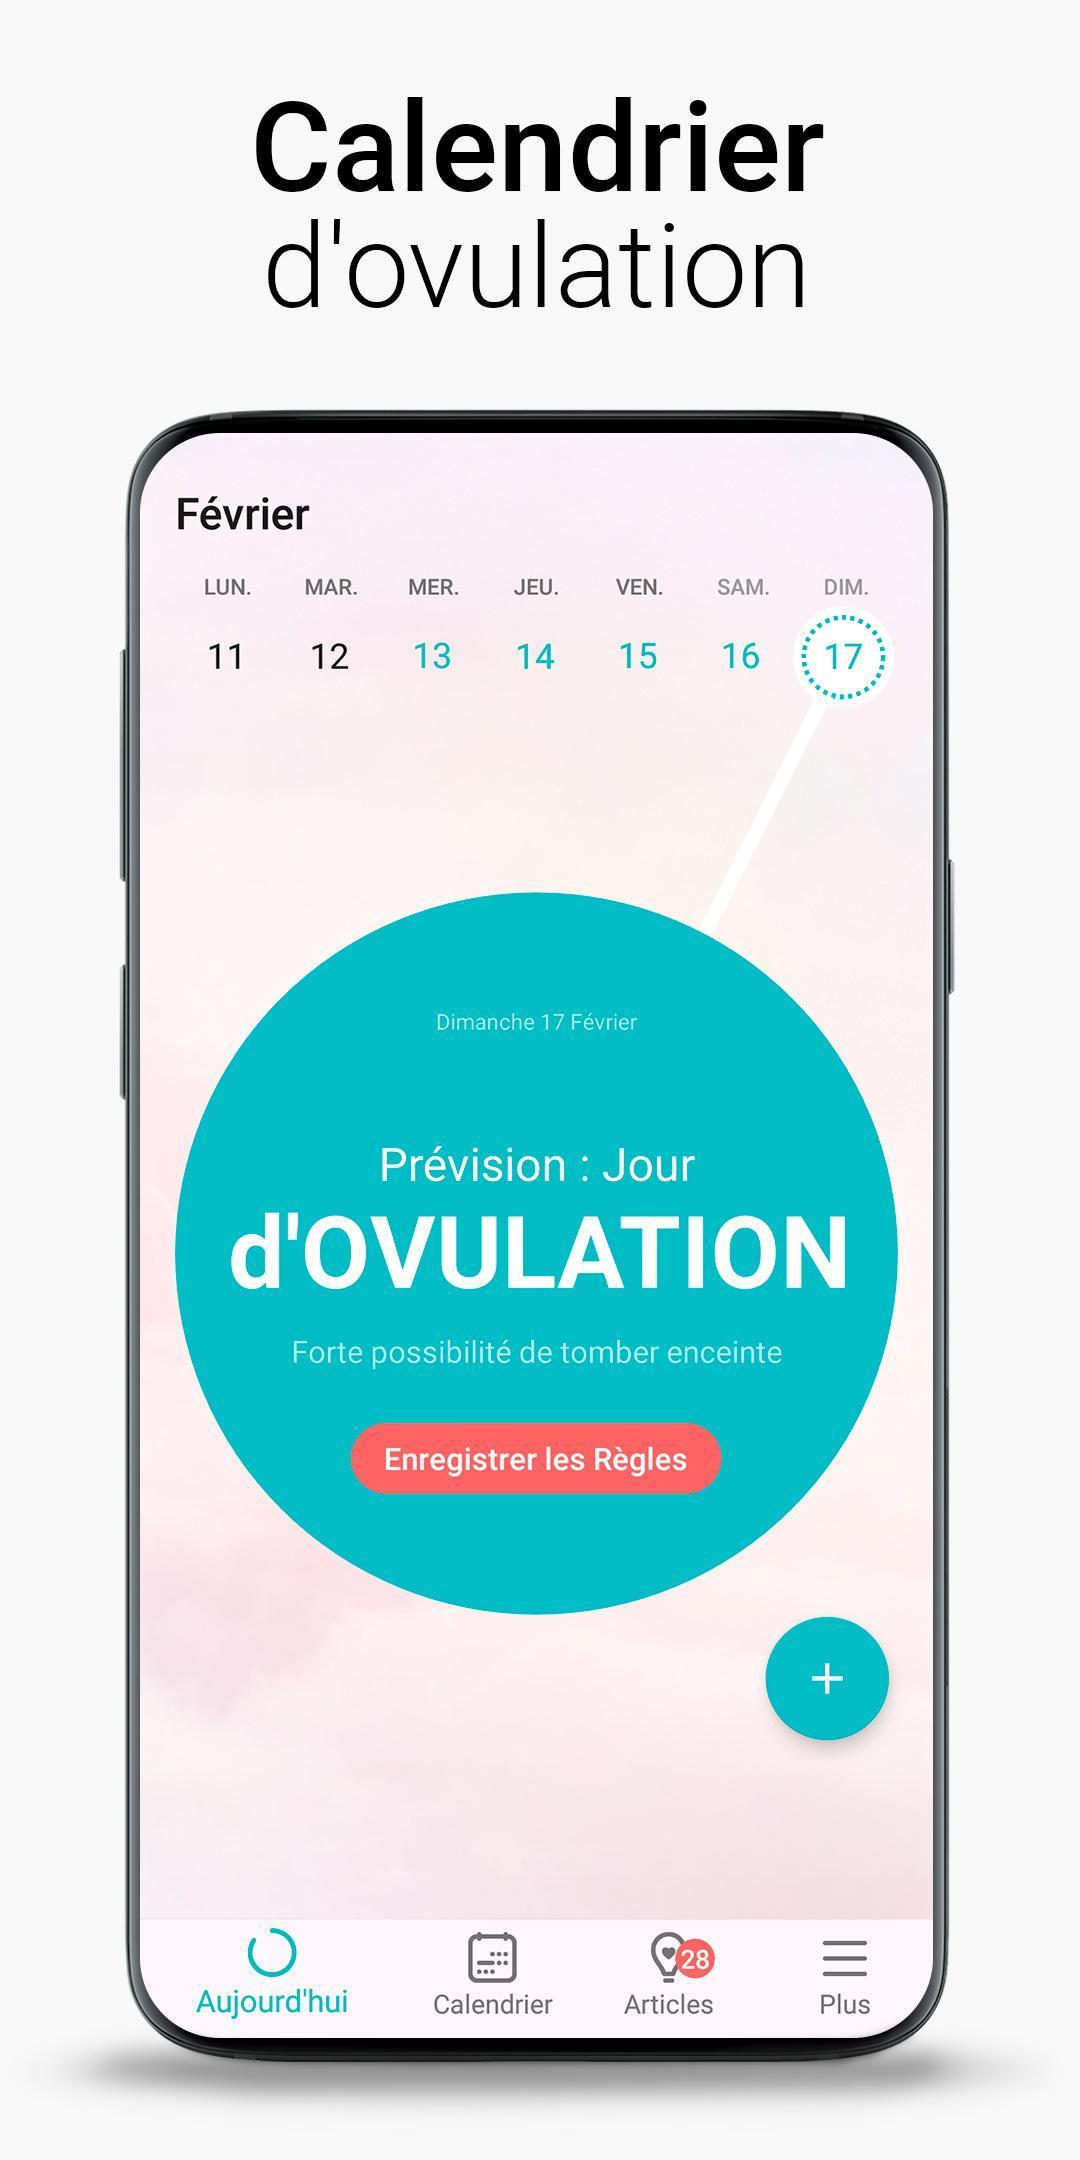 Calendrier Ovulation Et Regle.Salendrier Des Regles Flo Calendrier Menstruel Pour